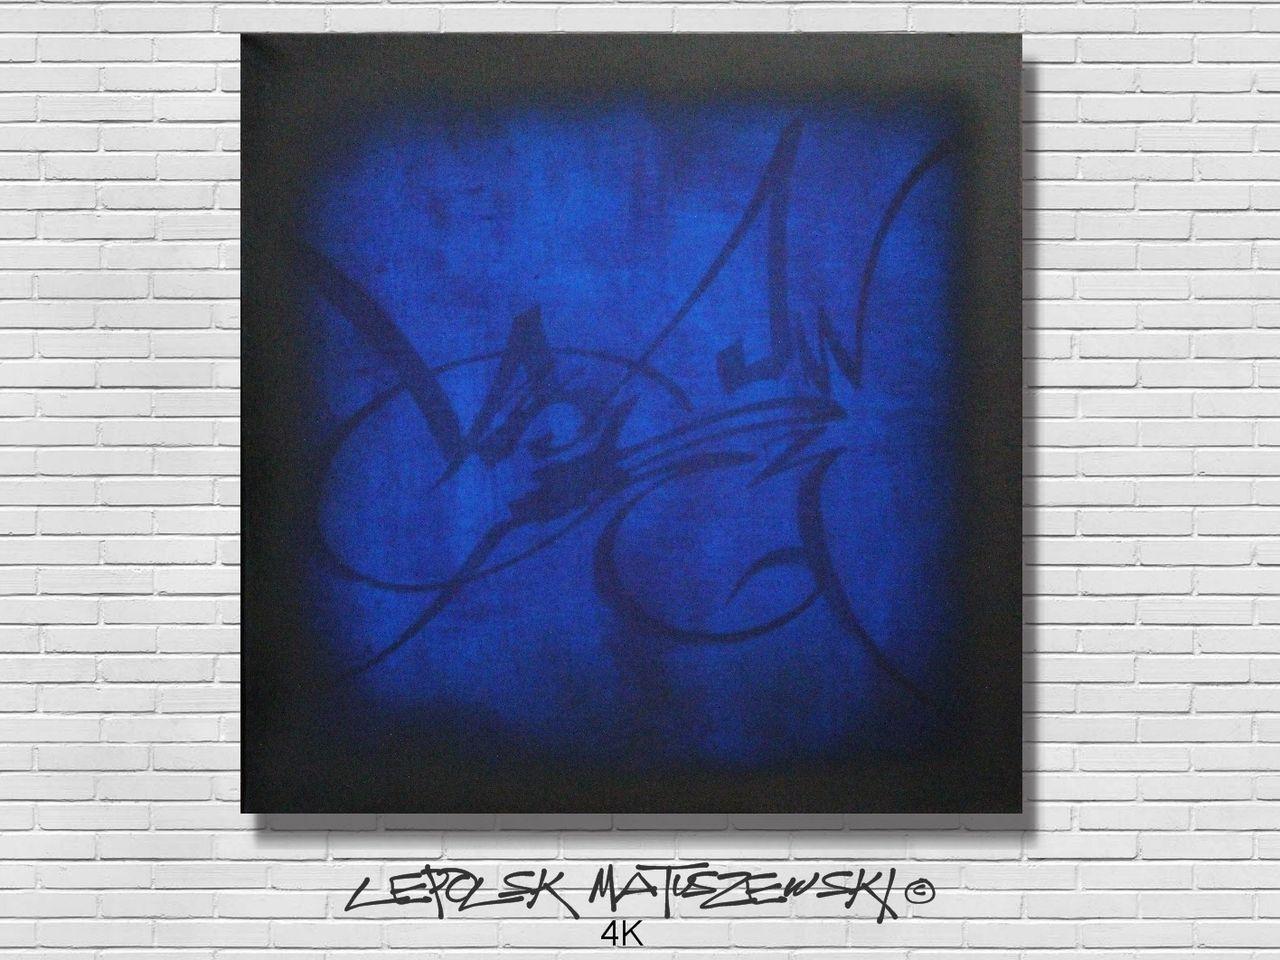 MISTER K  (Lepolsk Matuszewski) 4K  Expressionnisme abstrait contemporain